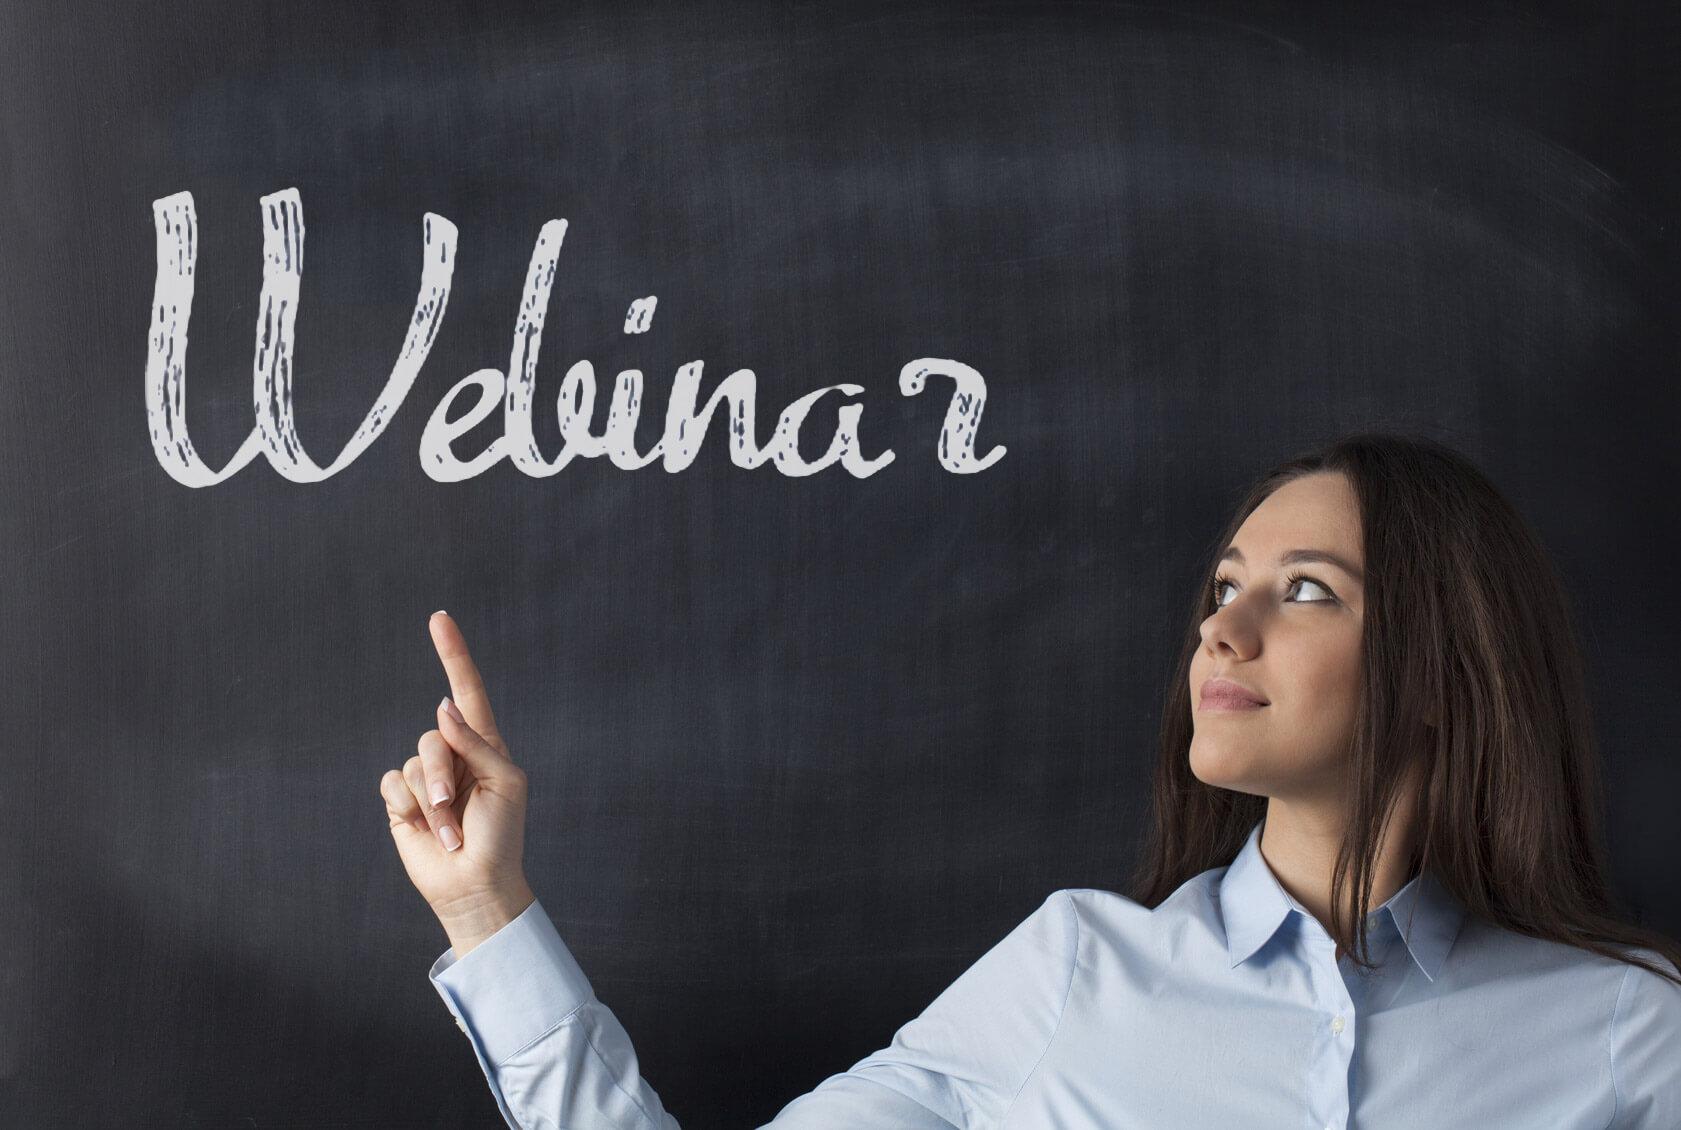 webinar as marketing instrument